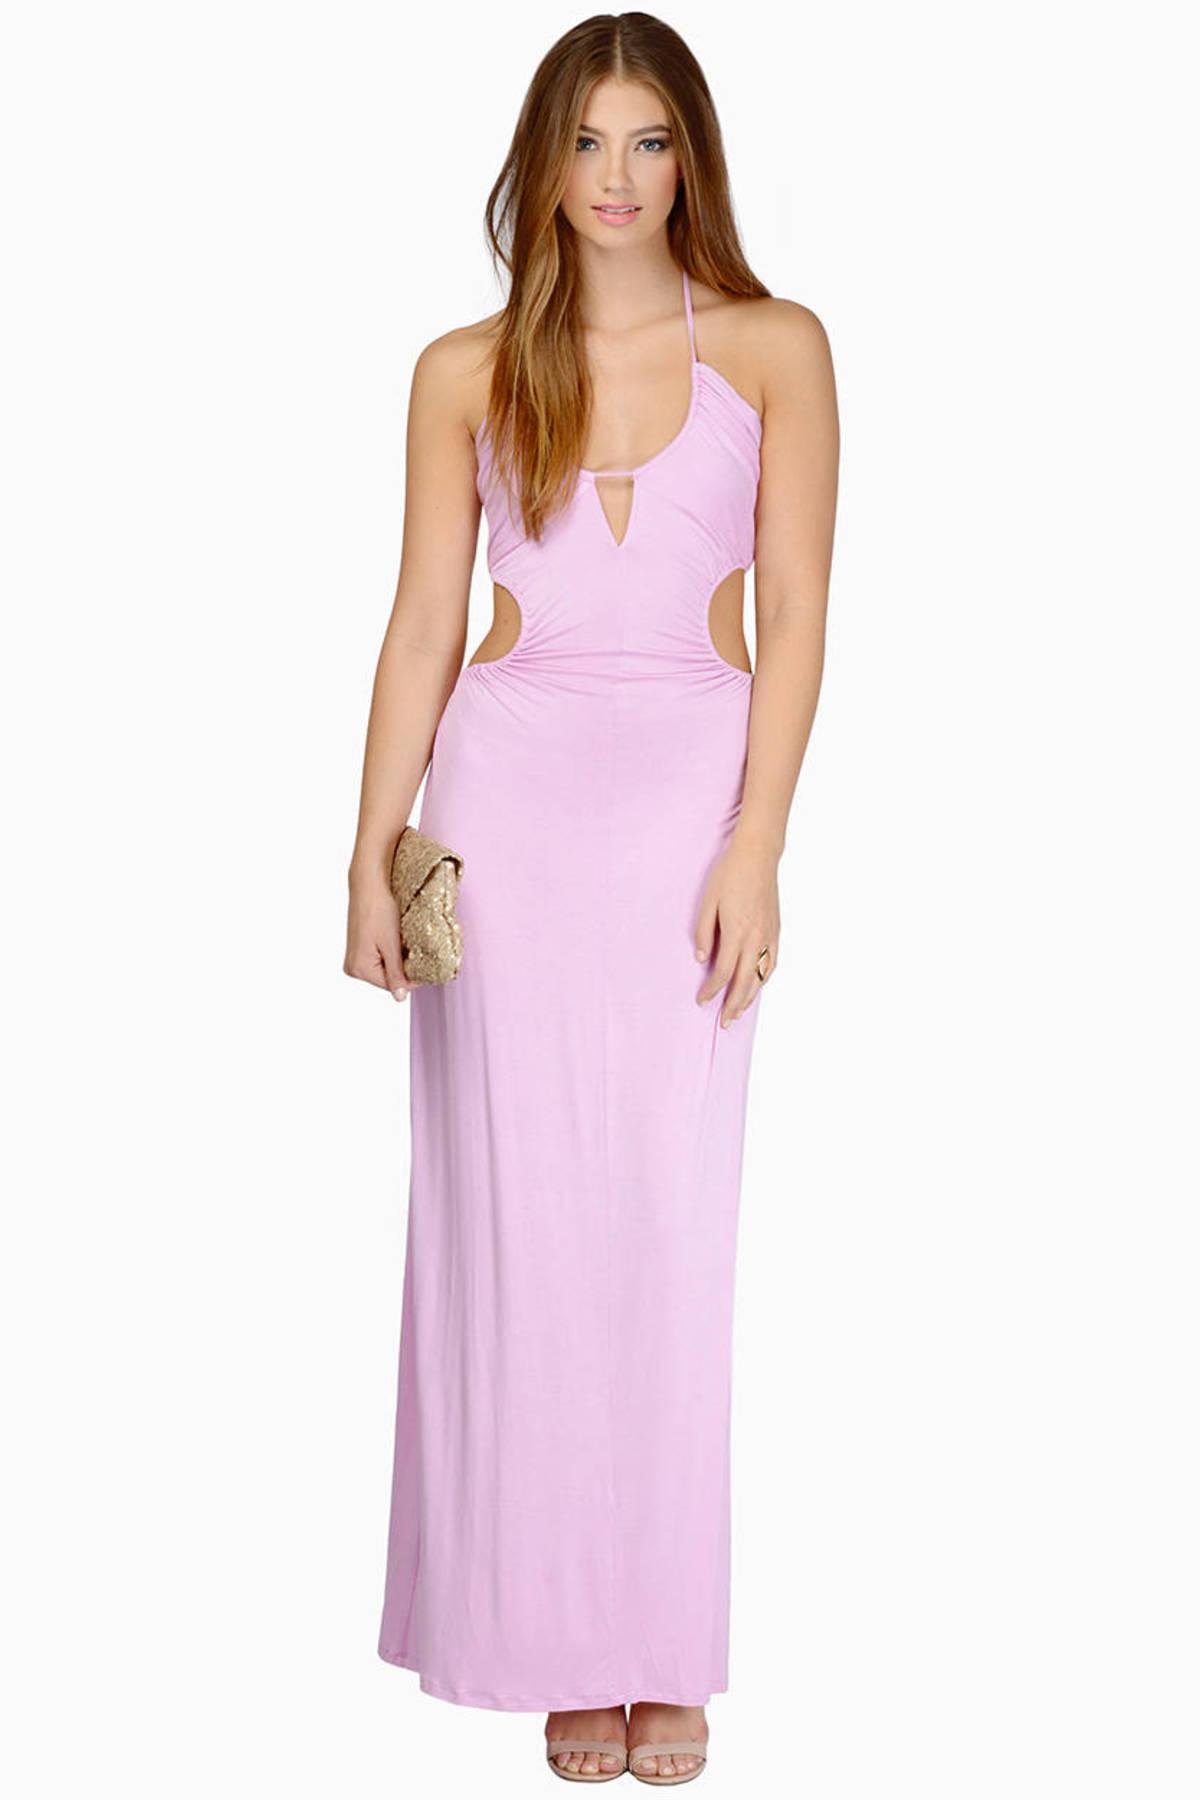 Sexy Orchid Maxi Dress - Cut Out Dress - Purple Dress - $17.00